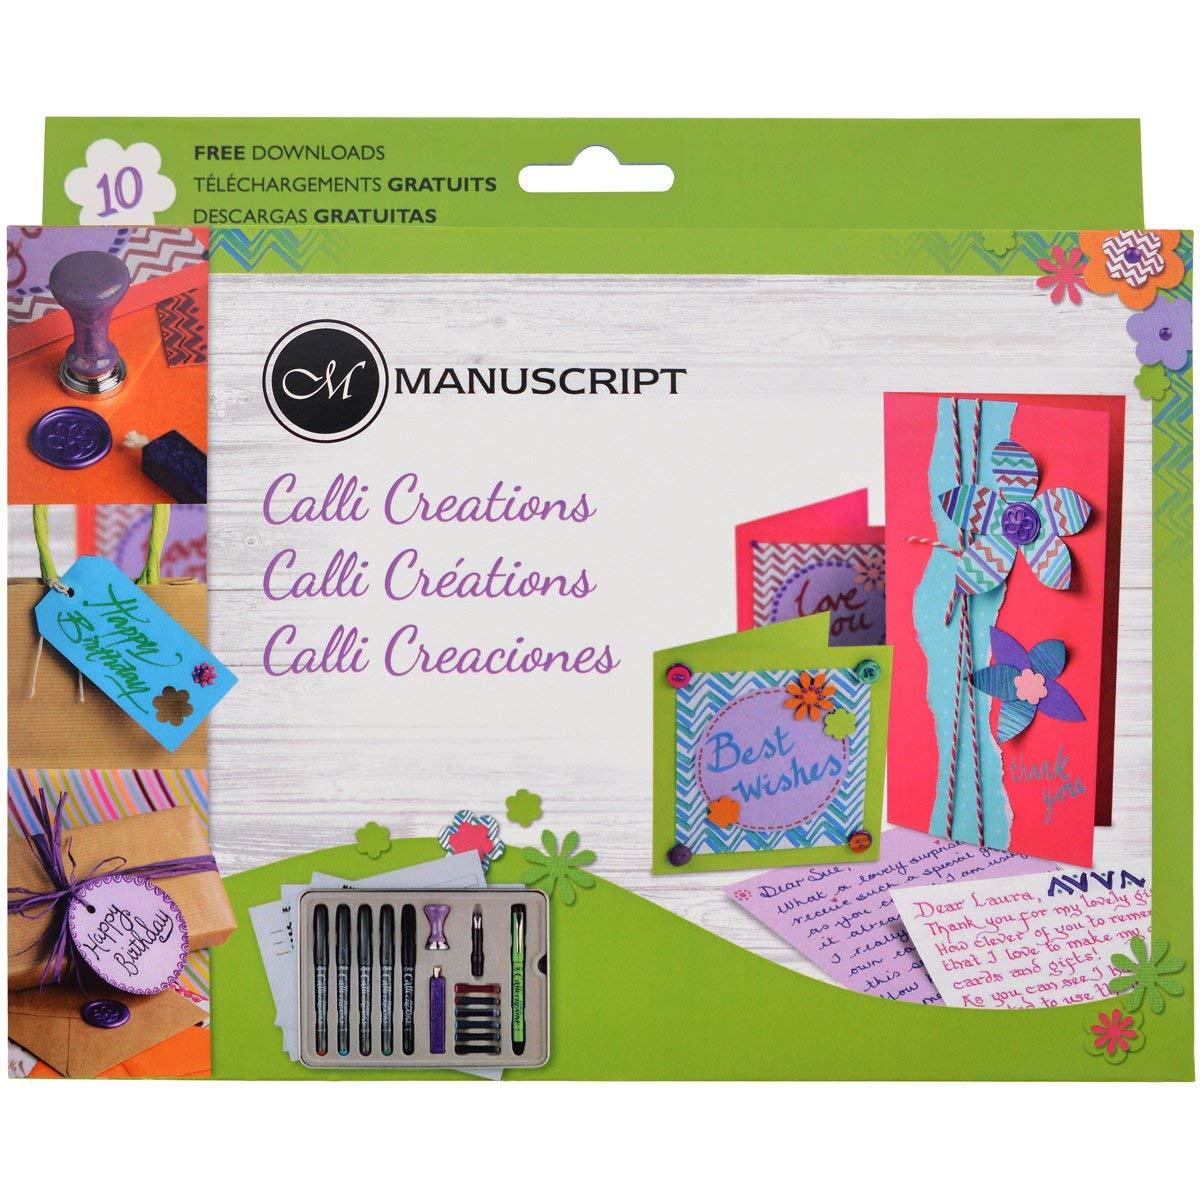 Manuscript Calli-Creations Set @ Amazon Add On £3.29